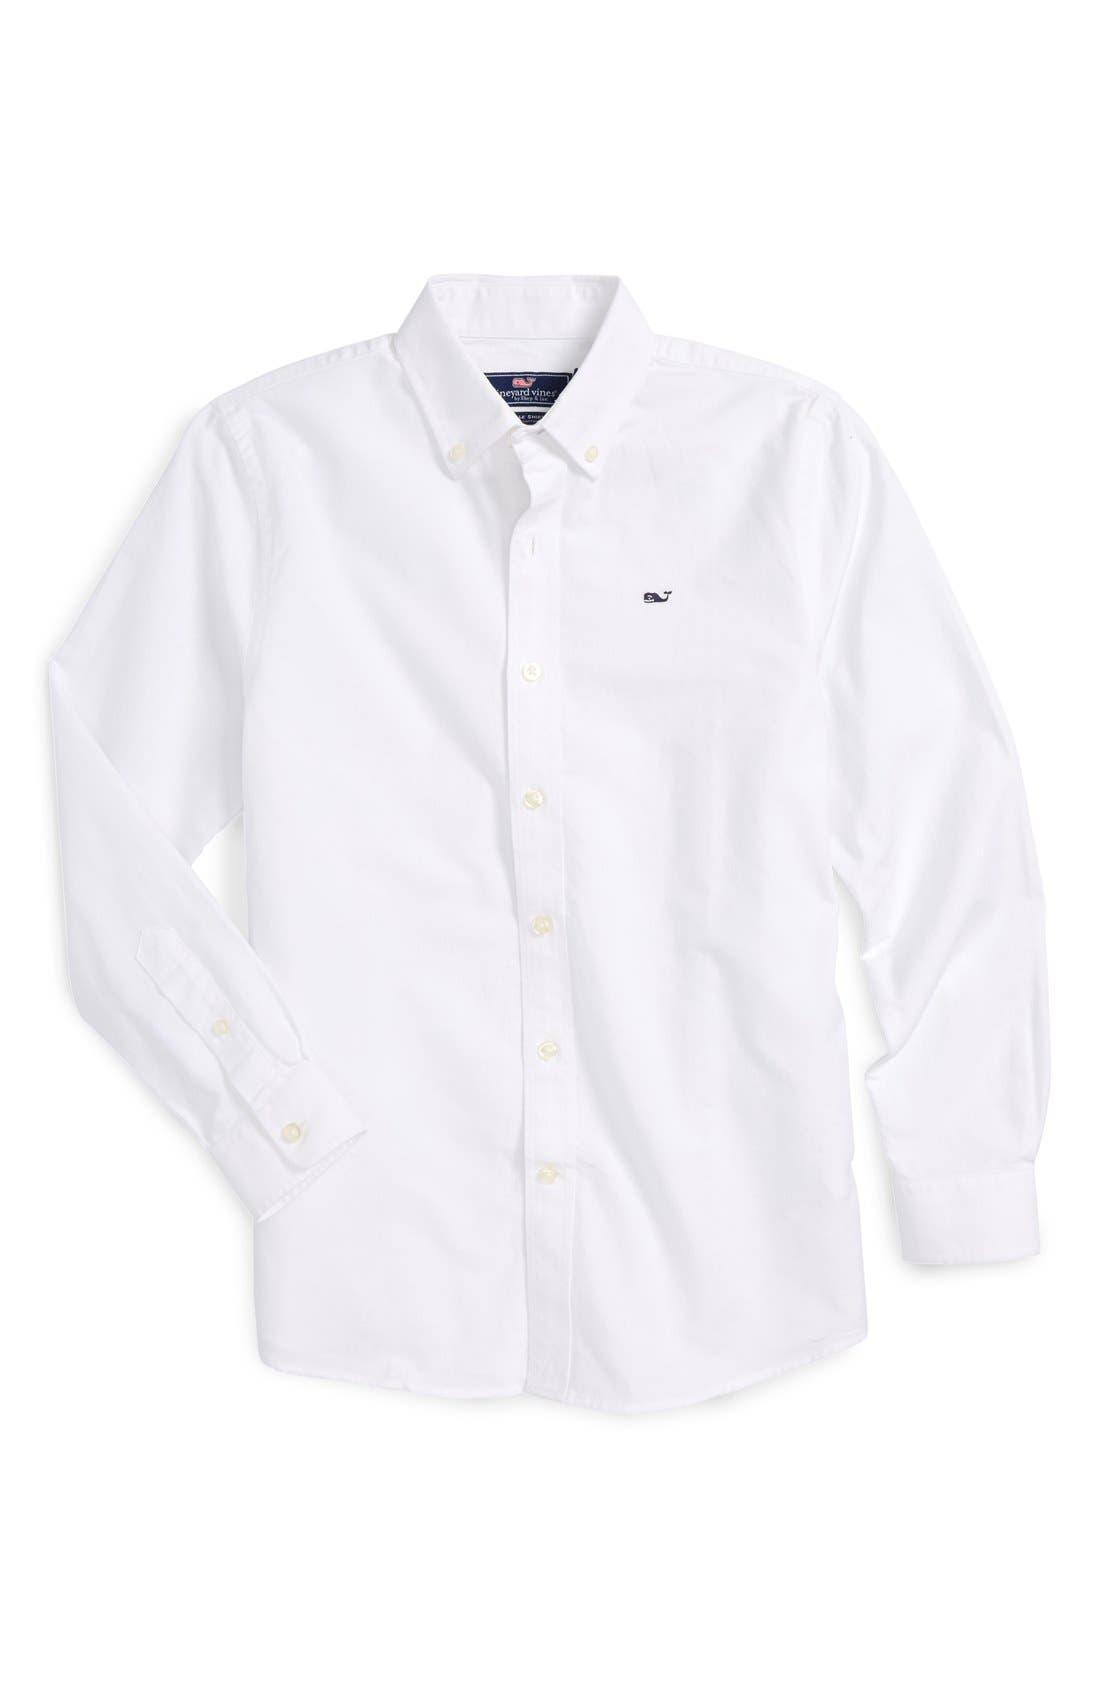 Woven Oxford Shirt,                         Main,                         color, White Cap